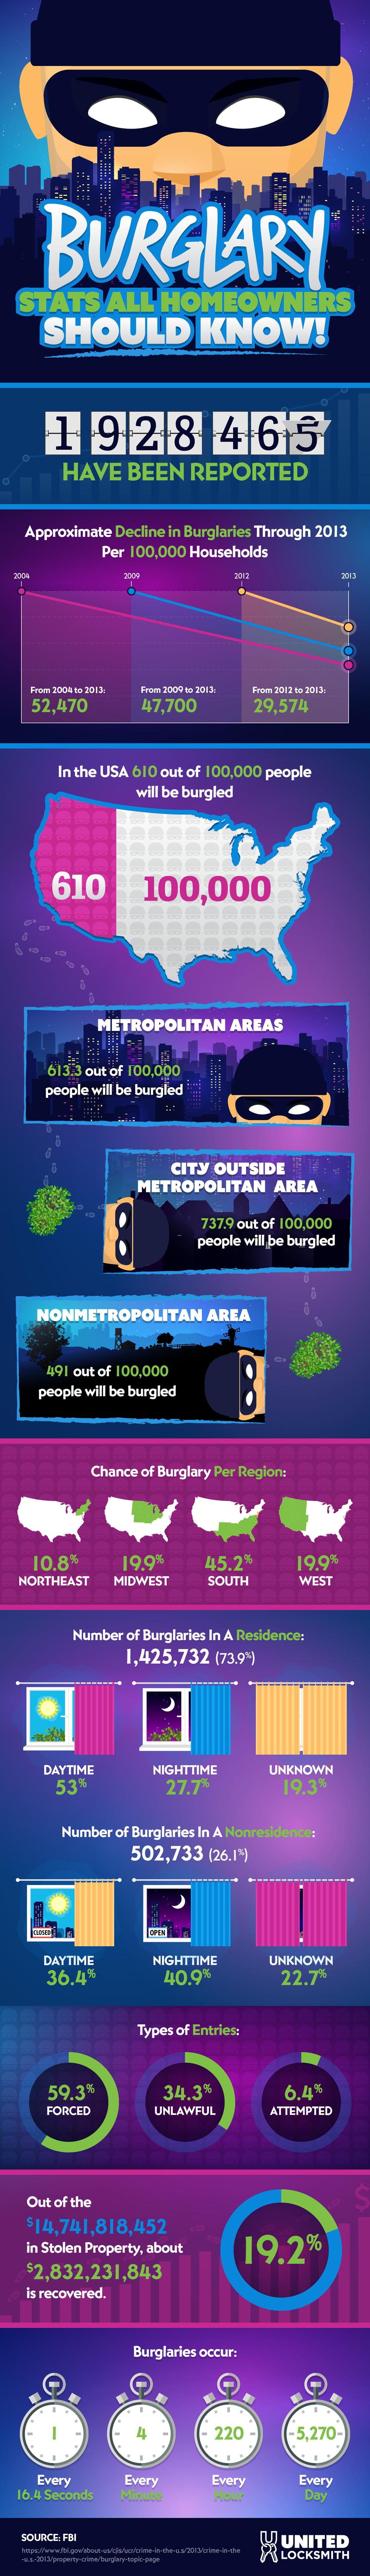 Burglary Statistics Infographic